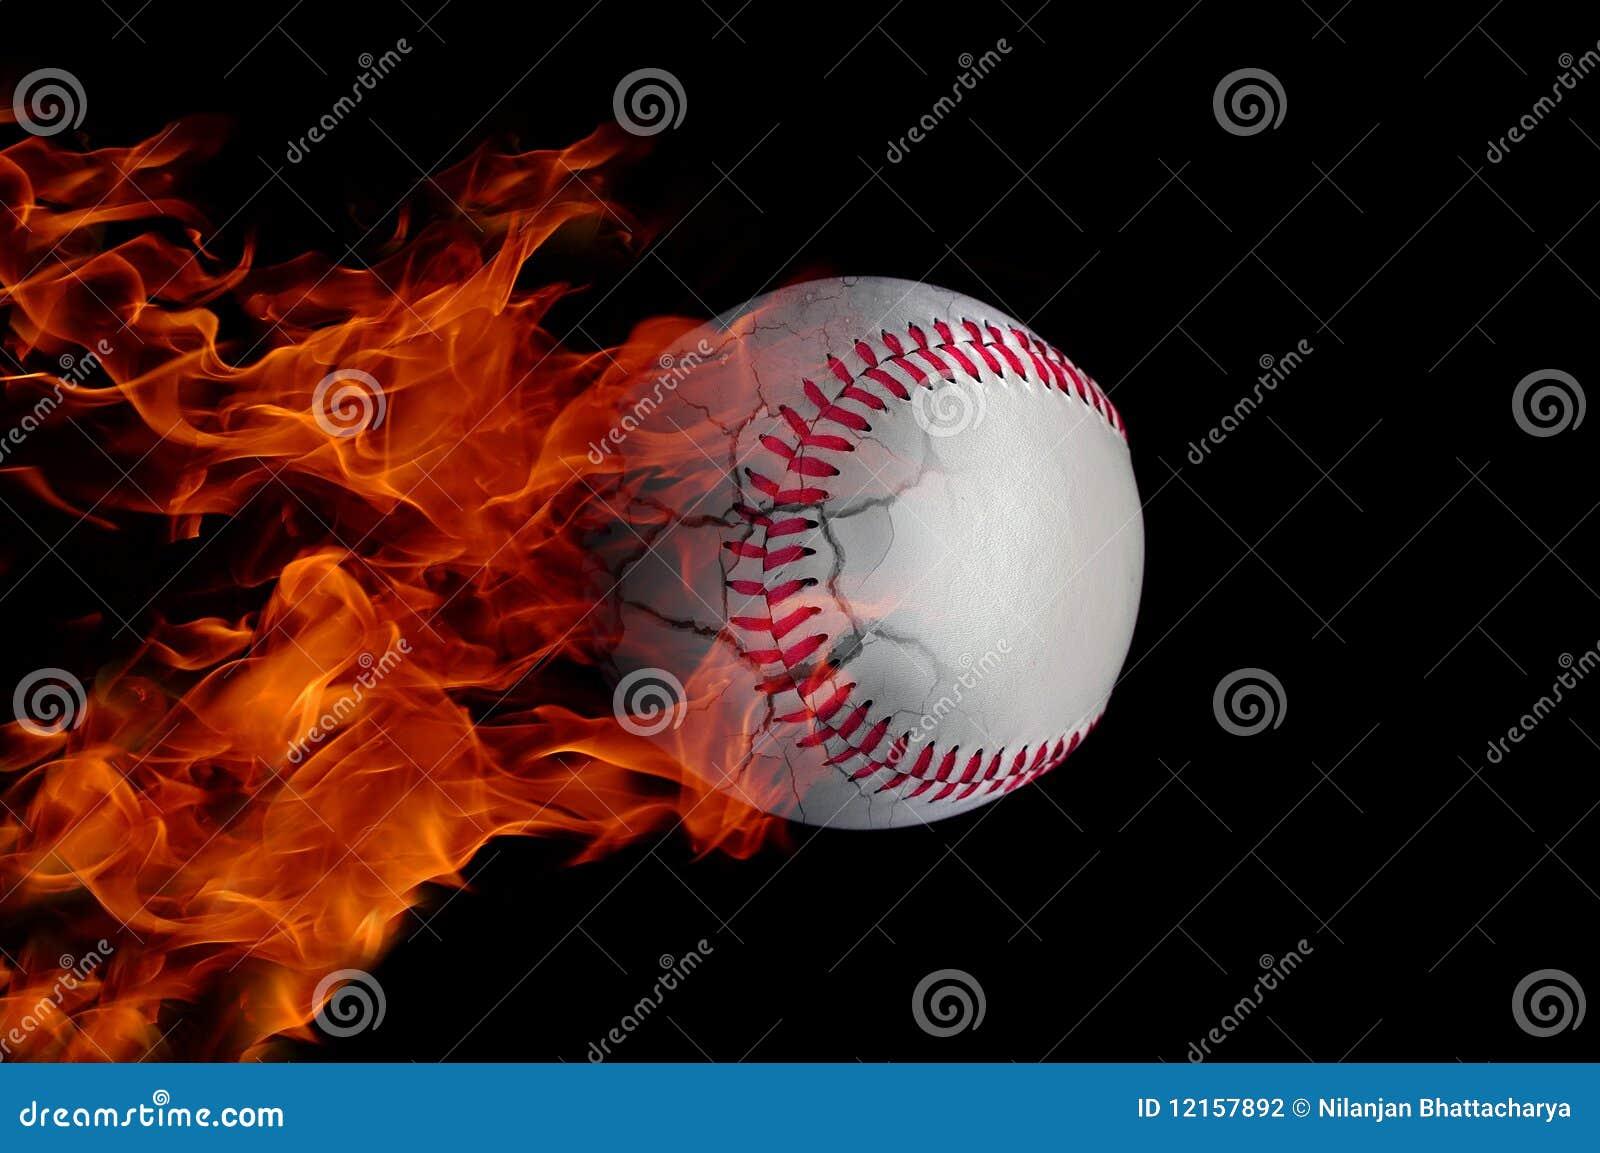 Baseballs on fire